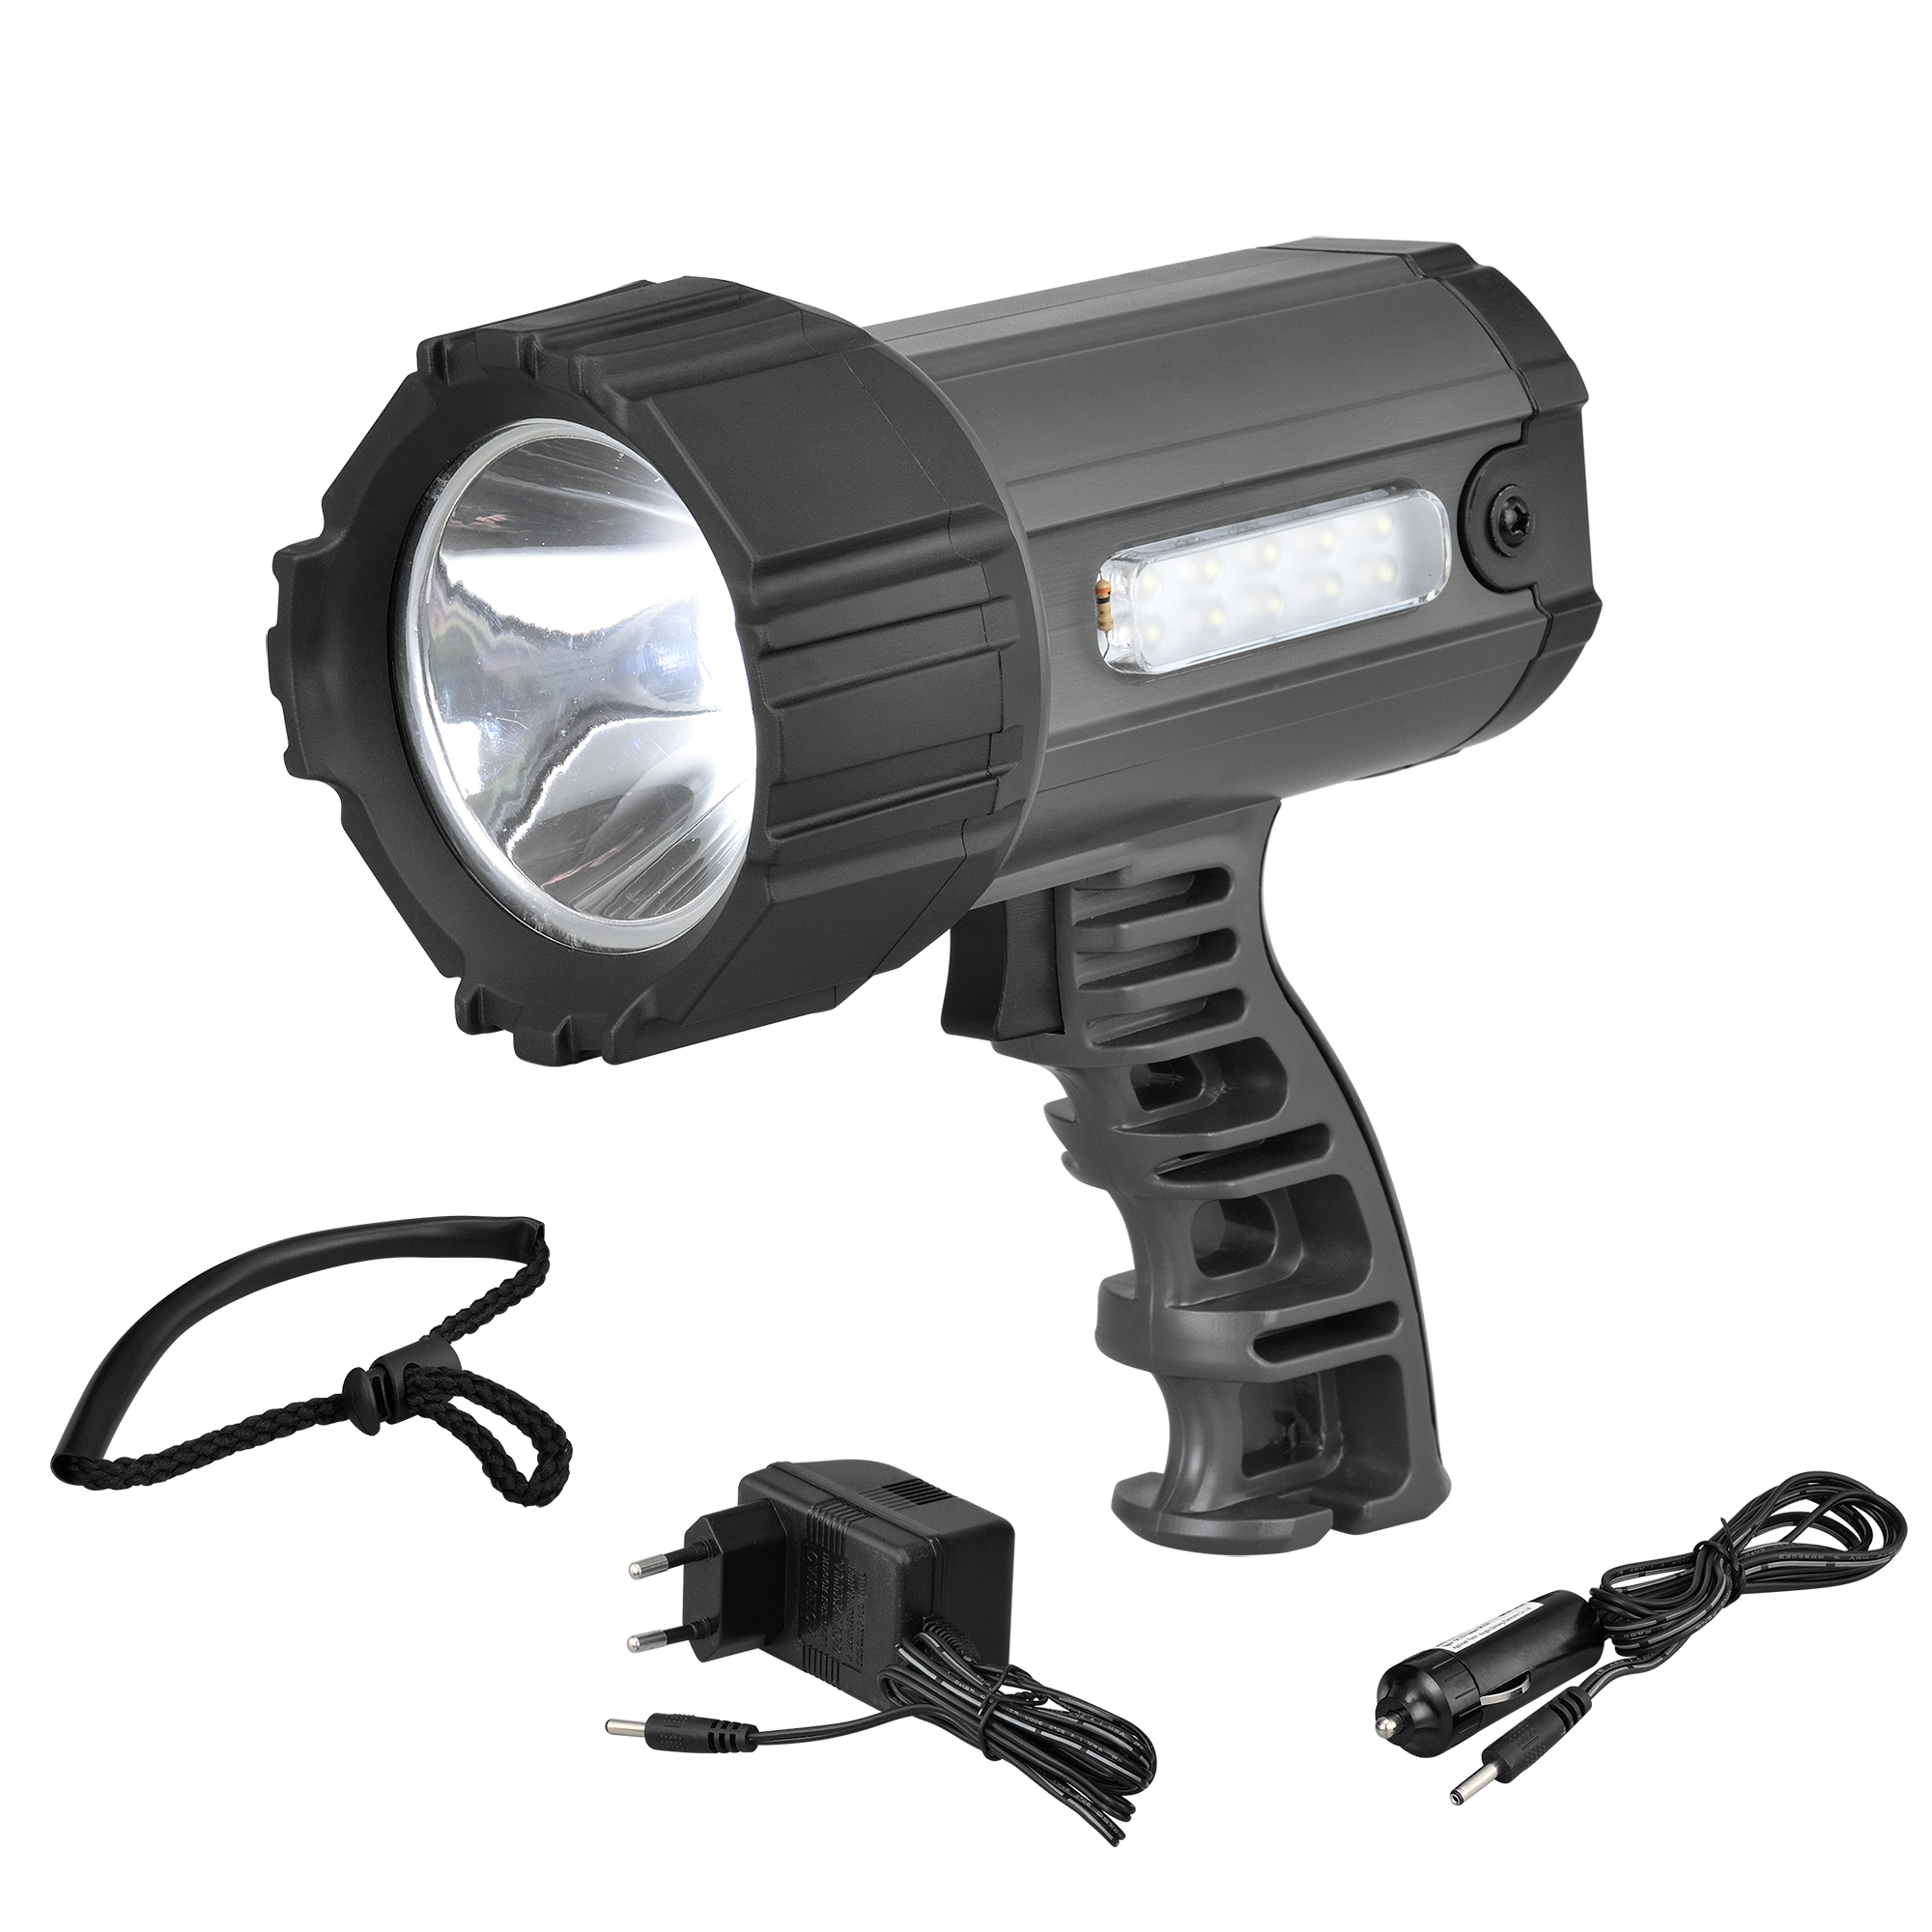 [in.tec]® LED svítilna STR-SLL012